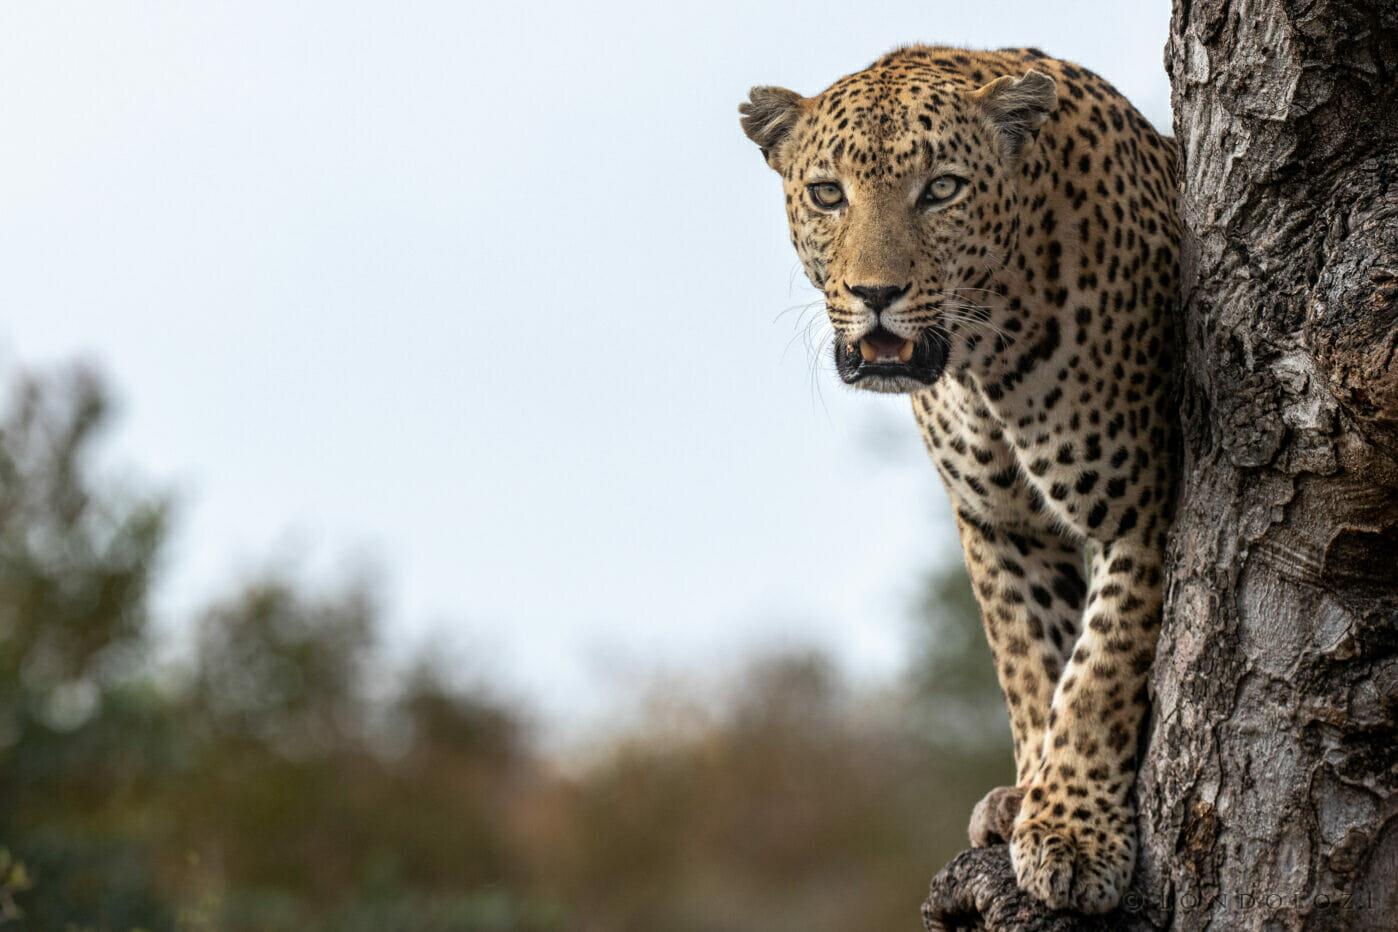 Dlr Dean De La Rey 06 21 Leopard Senegal Bush